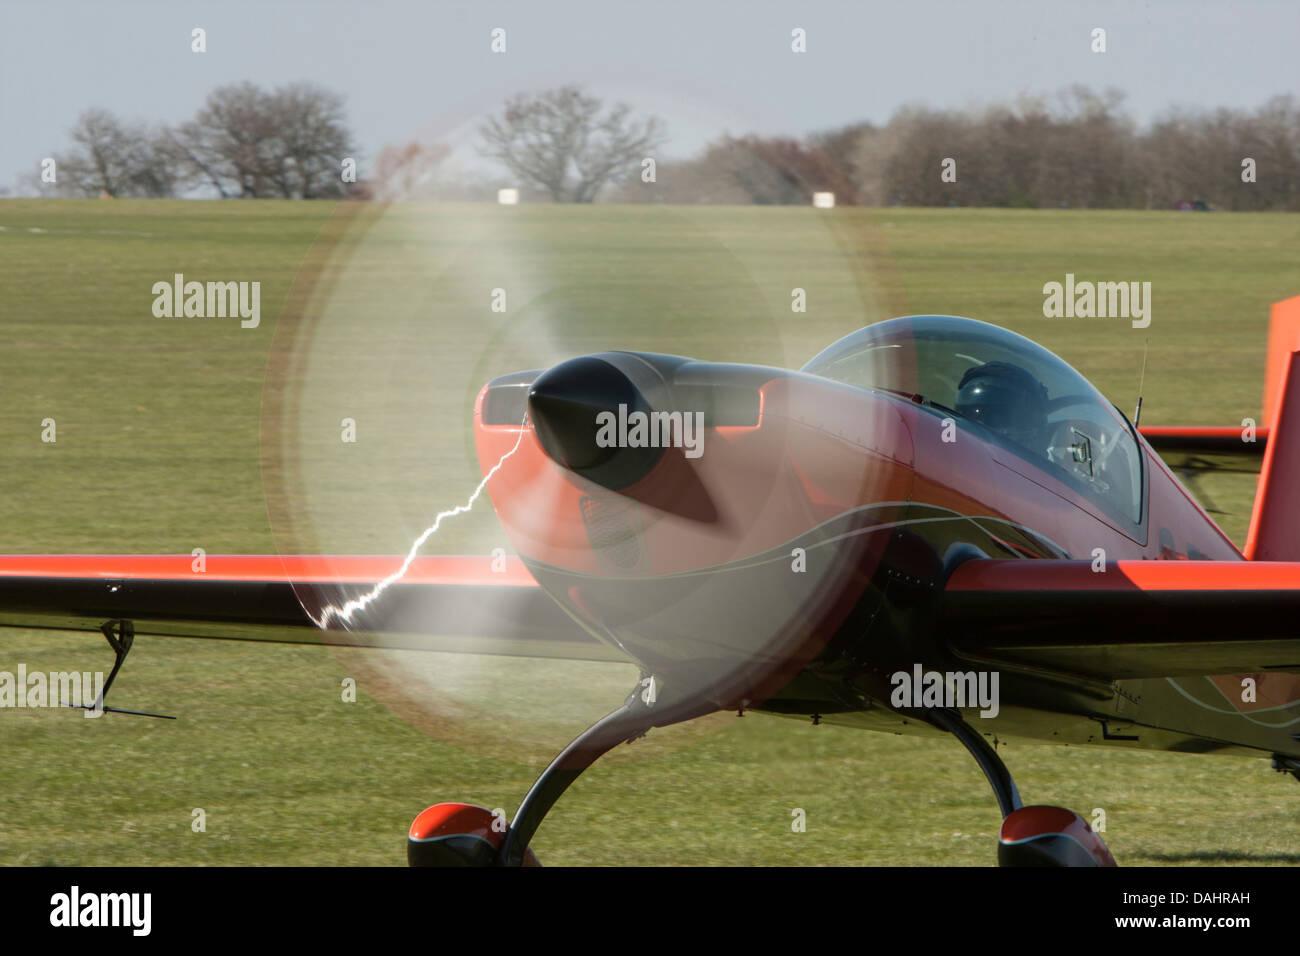 Extra EA-300L, part of 'The Blades' aerobatic team based at Sywell Aerodrome, Northampton, England - Stock Image